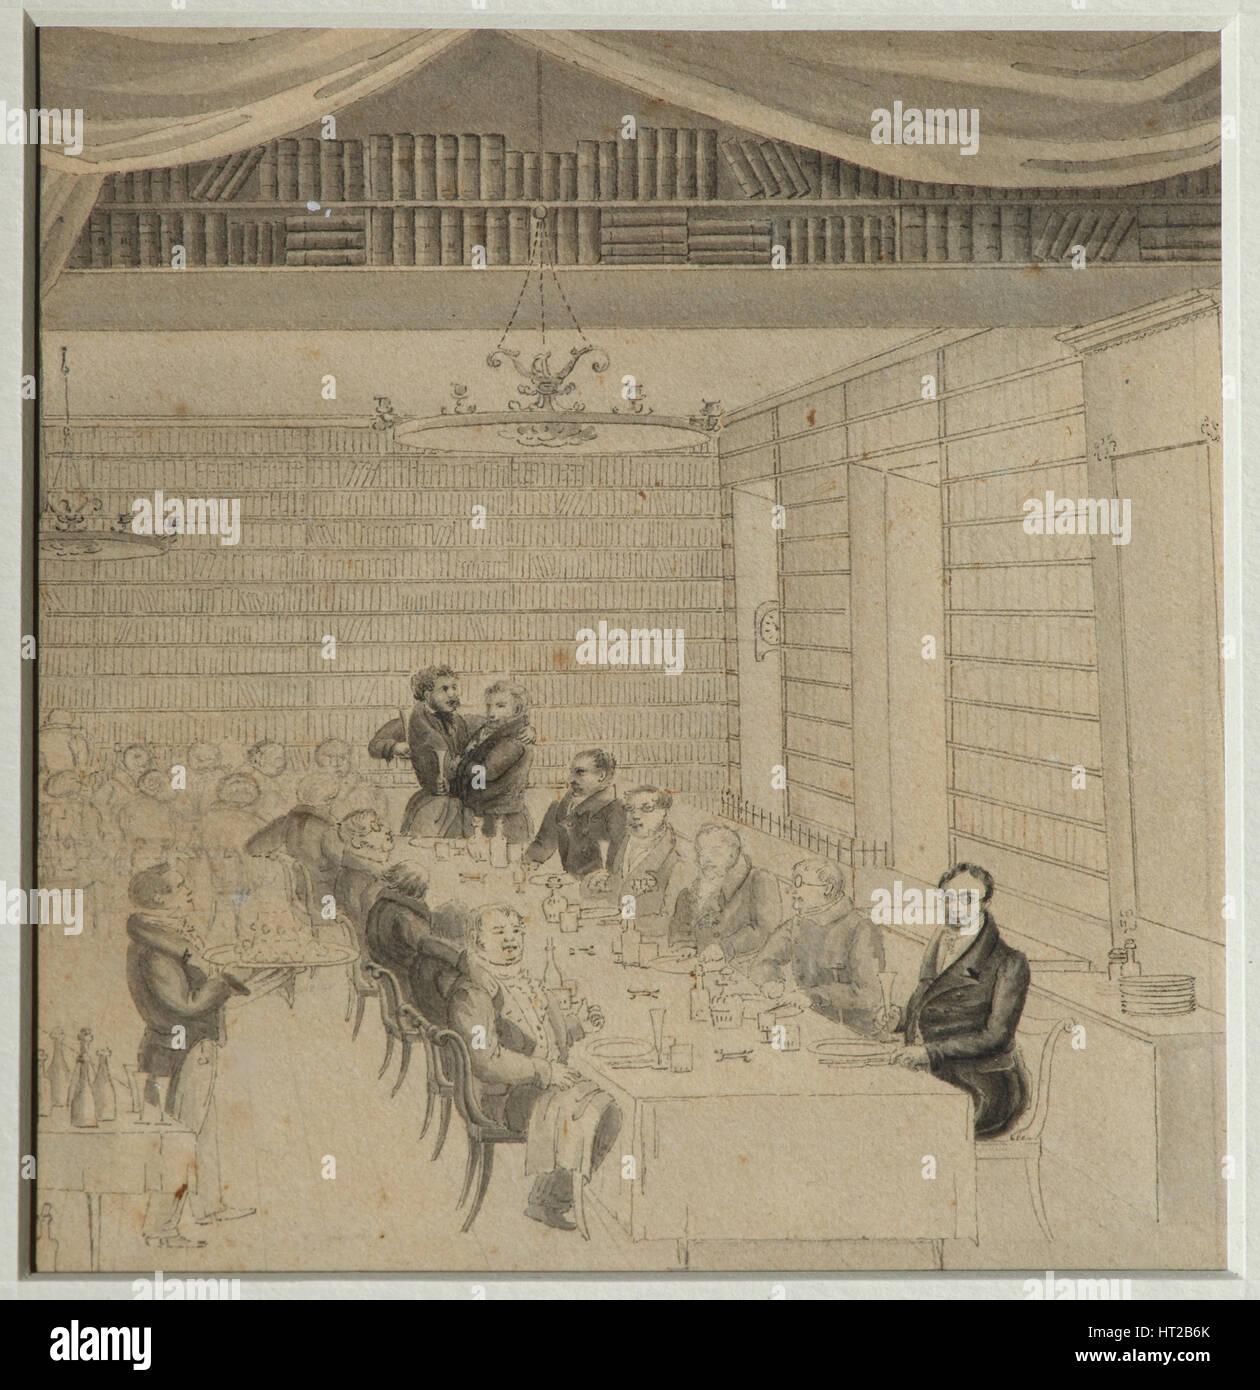 Literary Feasting in the bookstore of Aleksander Smirdin, 1832. Artist: Briullov, Alexander Pavlovich (1798-1877) - Stock Image